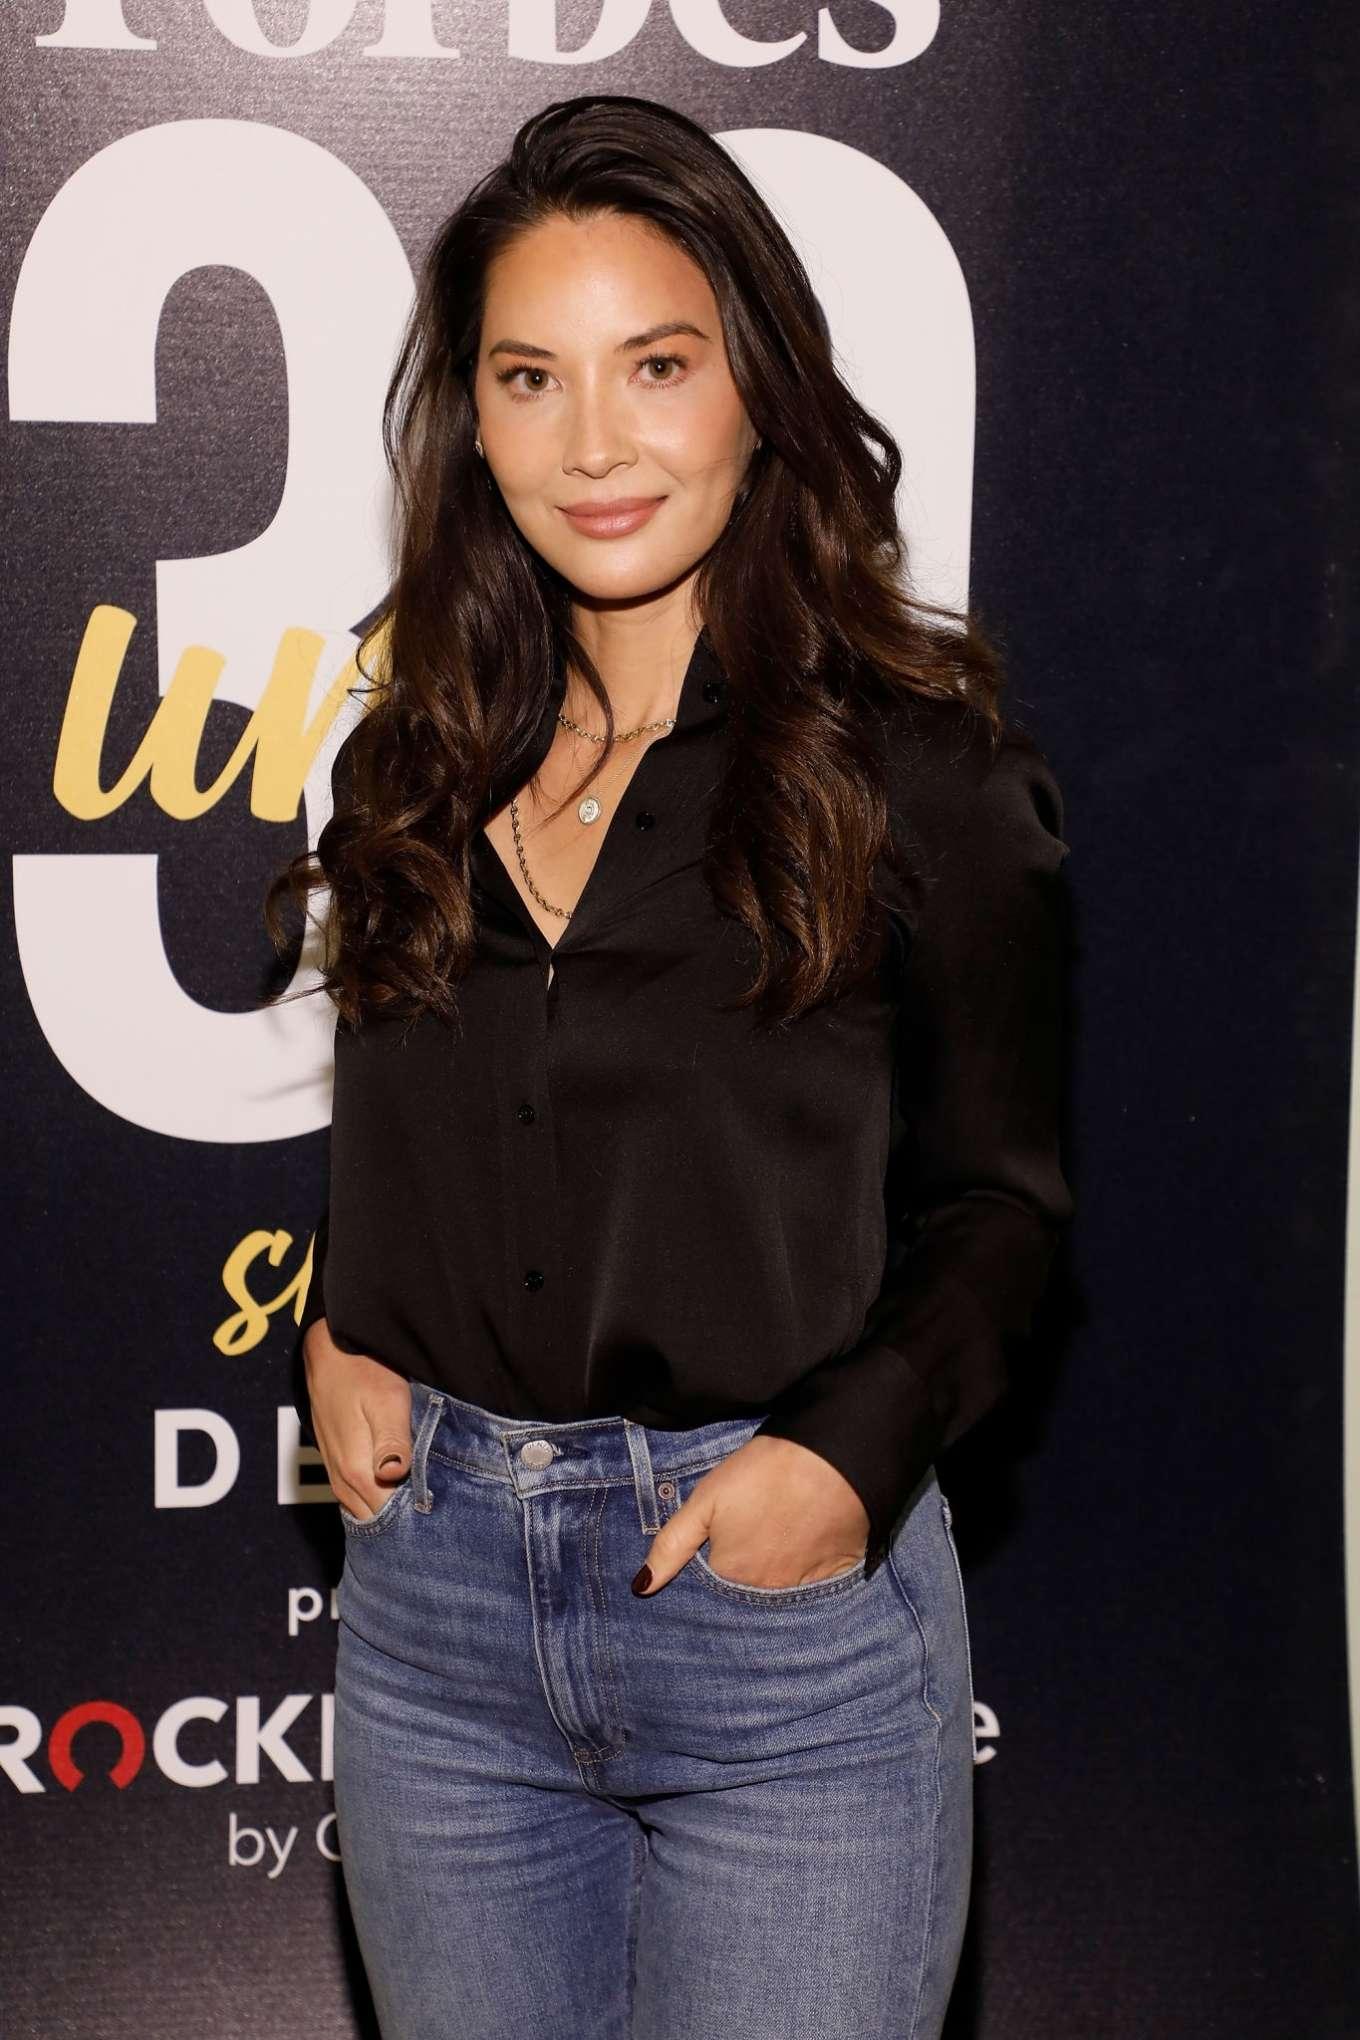 Olivia Munn 2019 : Olivia Munn – Forbes 30 Under 30 Summit 2019-11